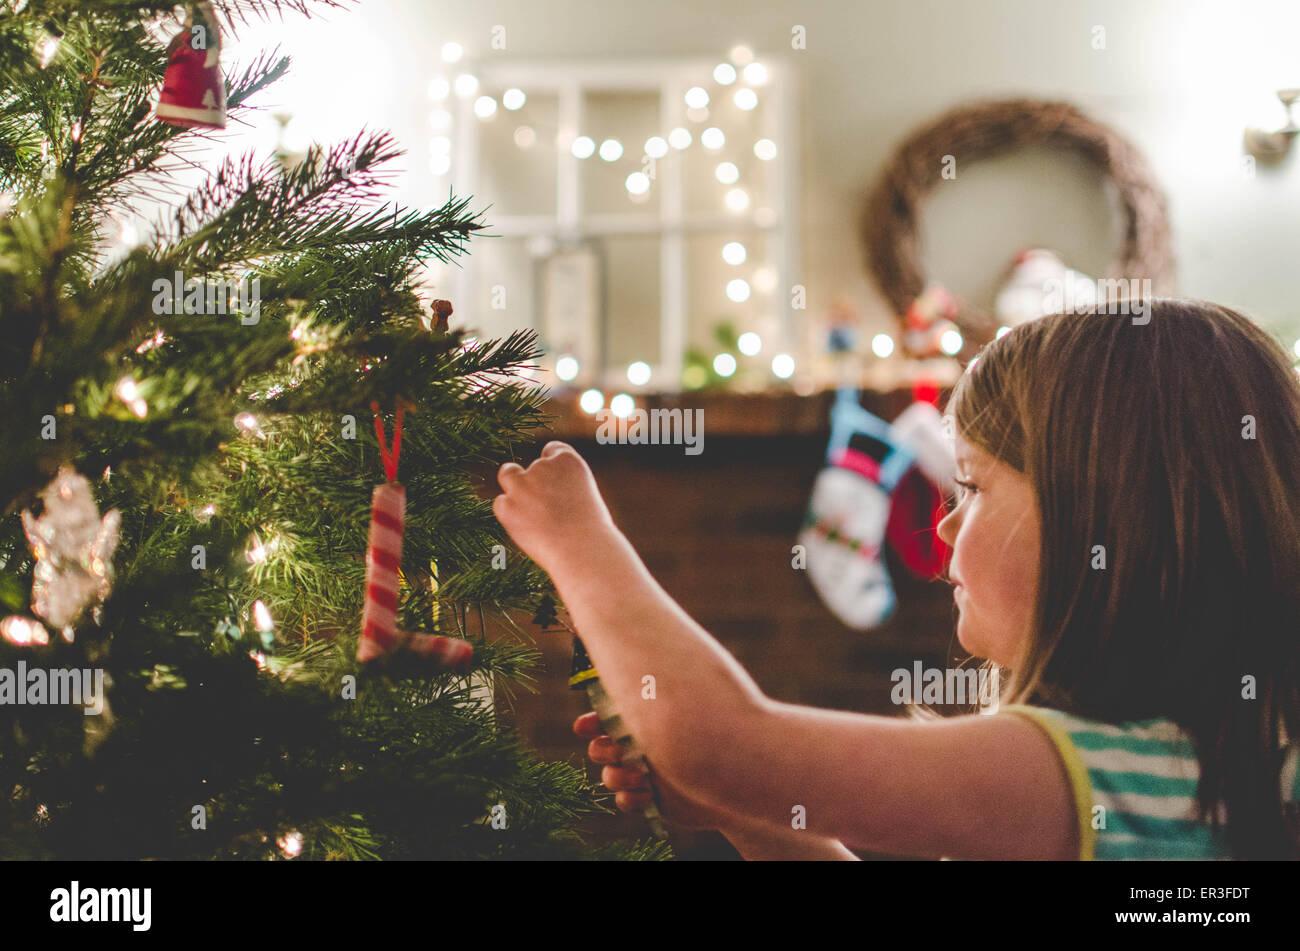 Girl decorating a Christmas tree - Stock Image